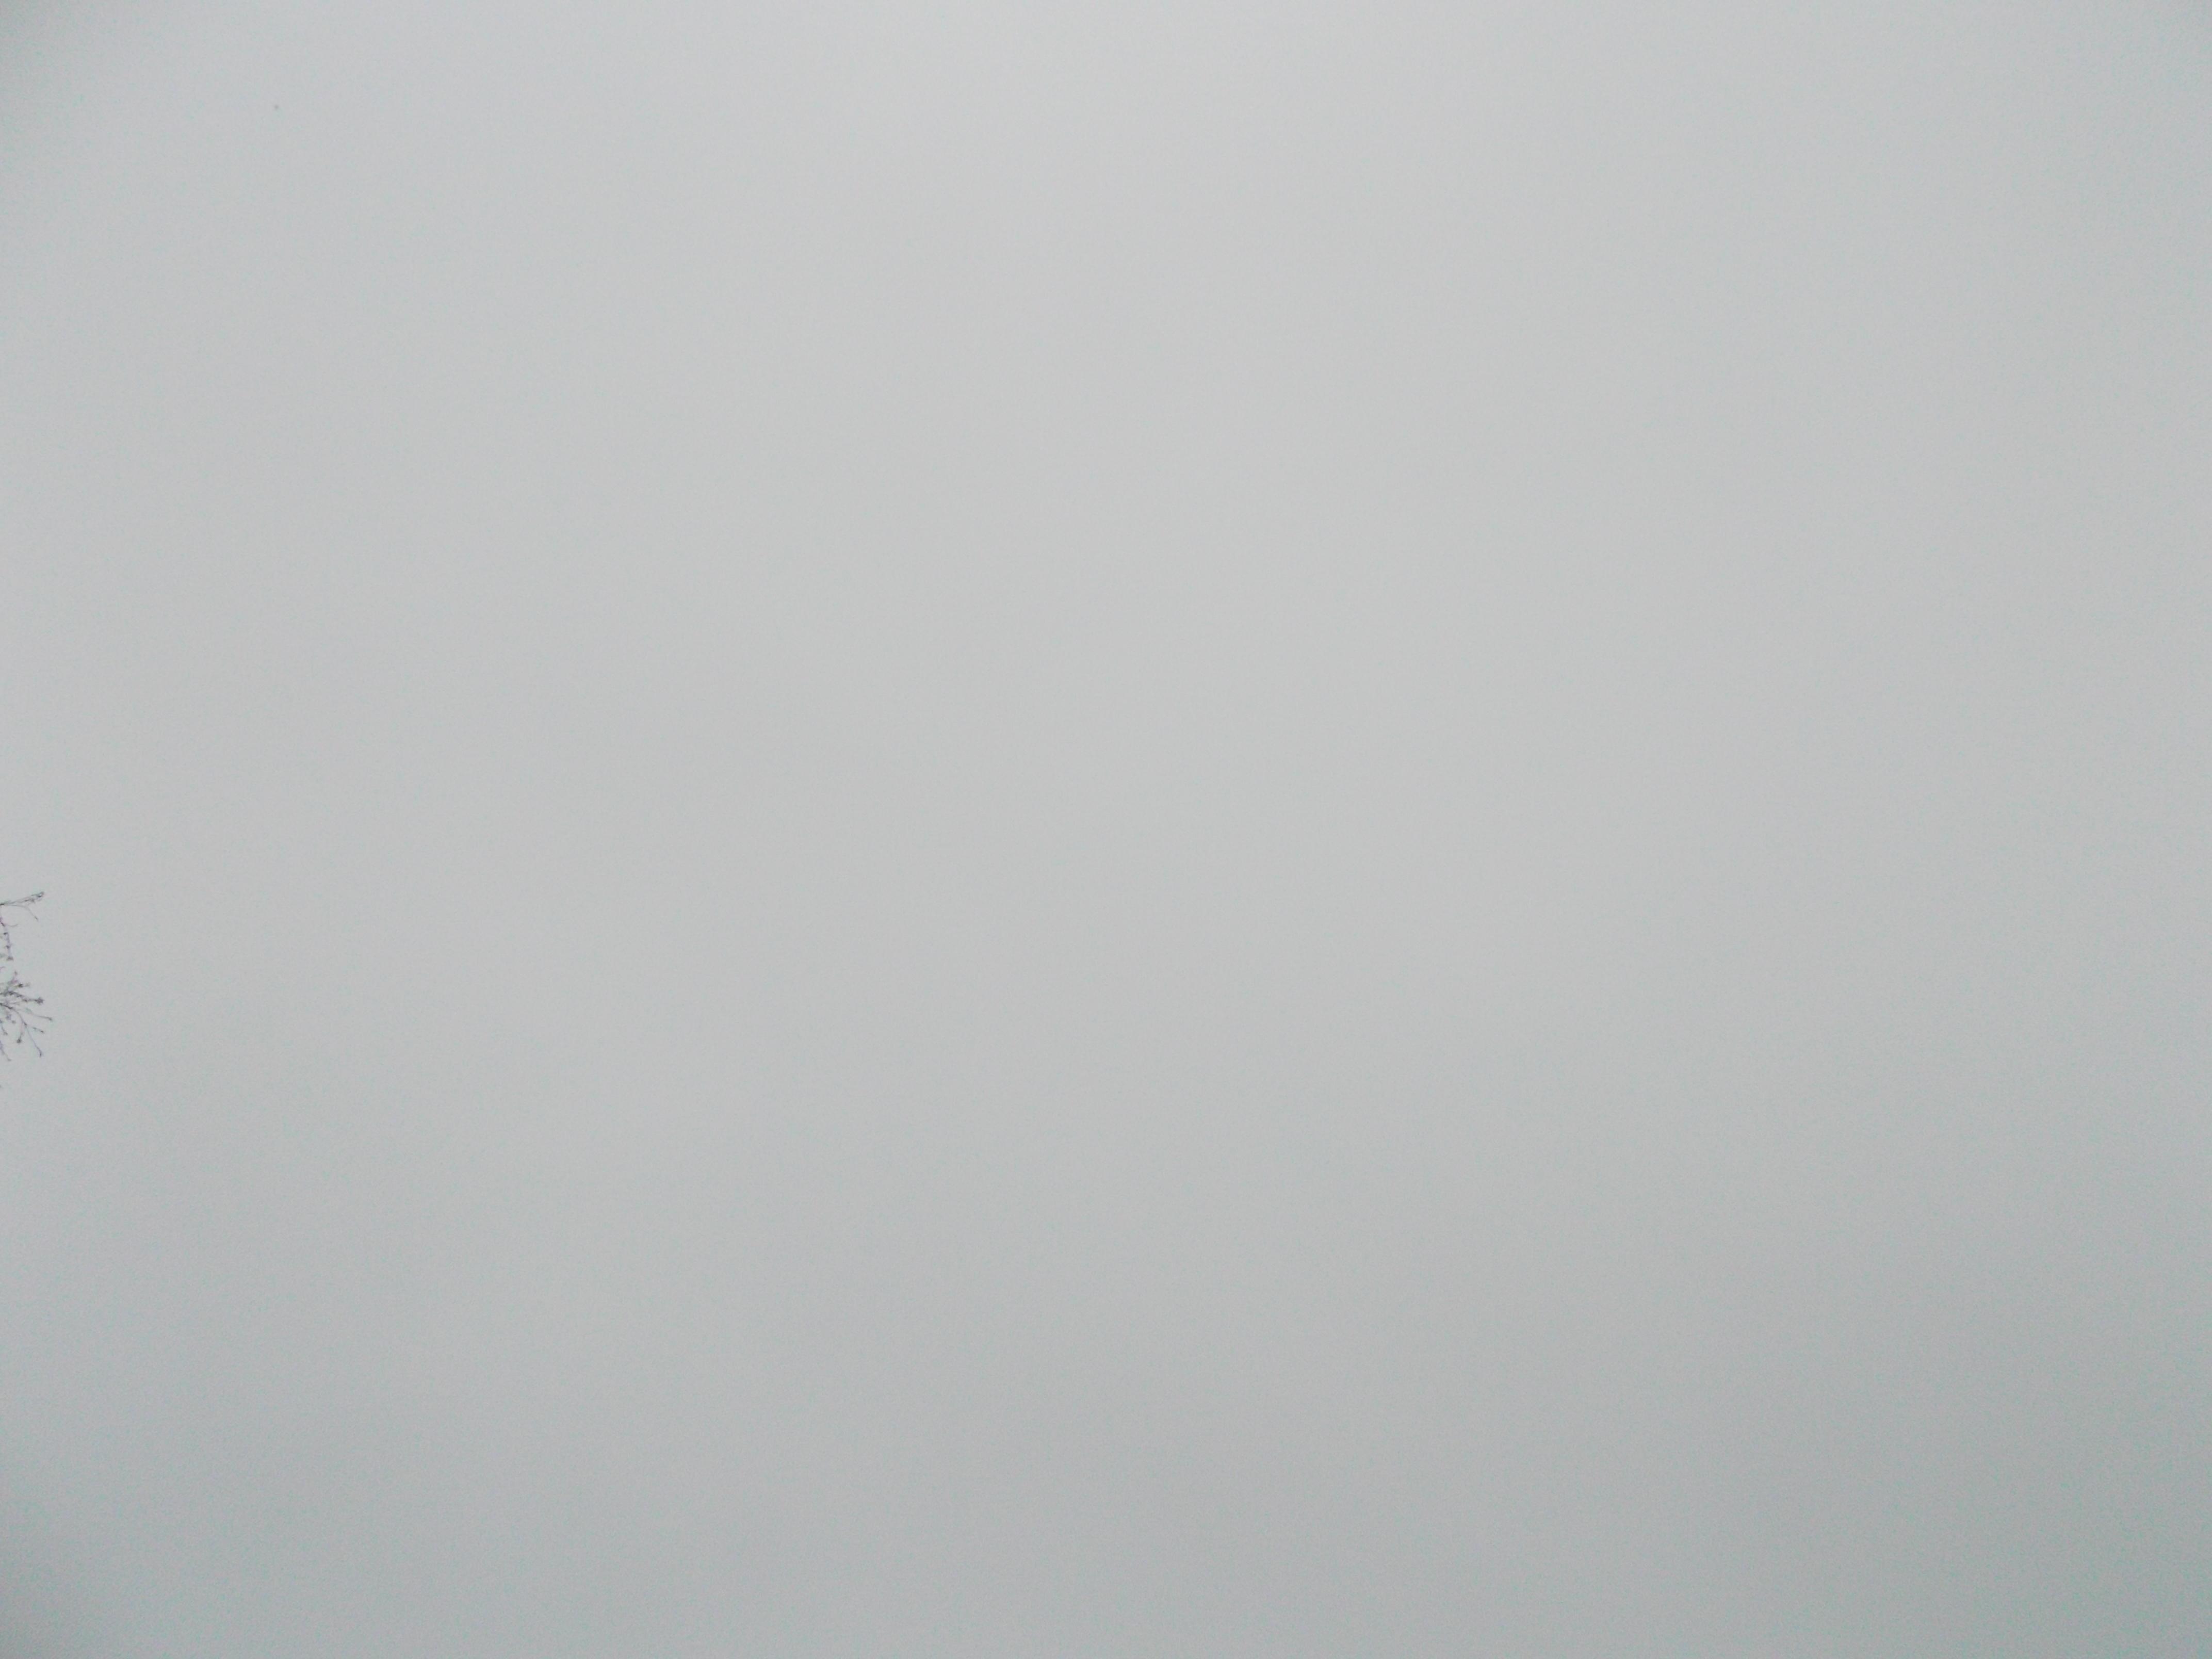 2013-01-06 Longitude -0.371 Latitude 49.182 Altitude 13 Heure 12h06